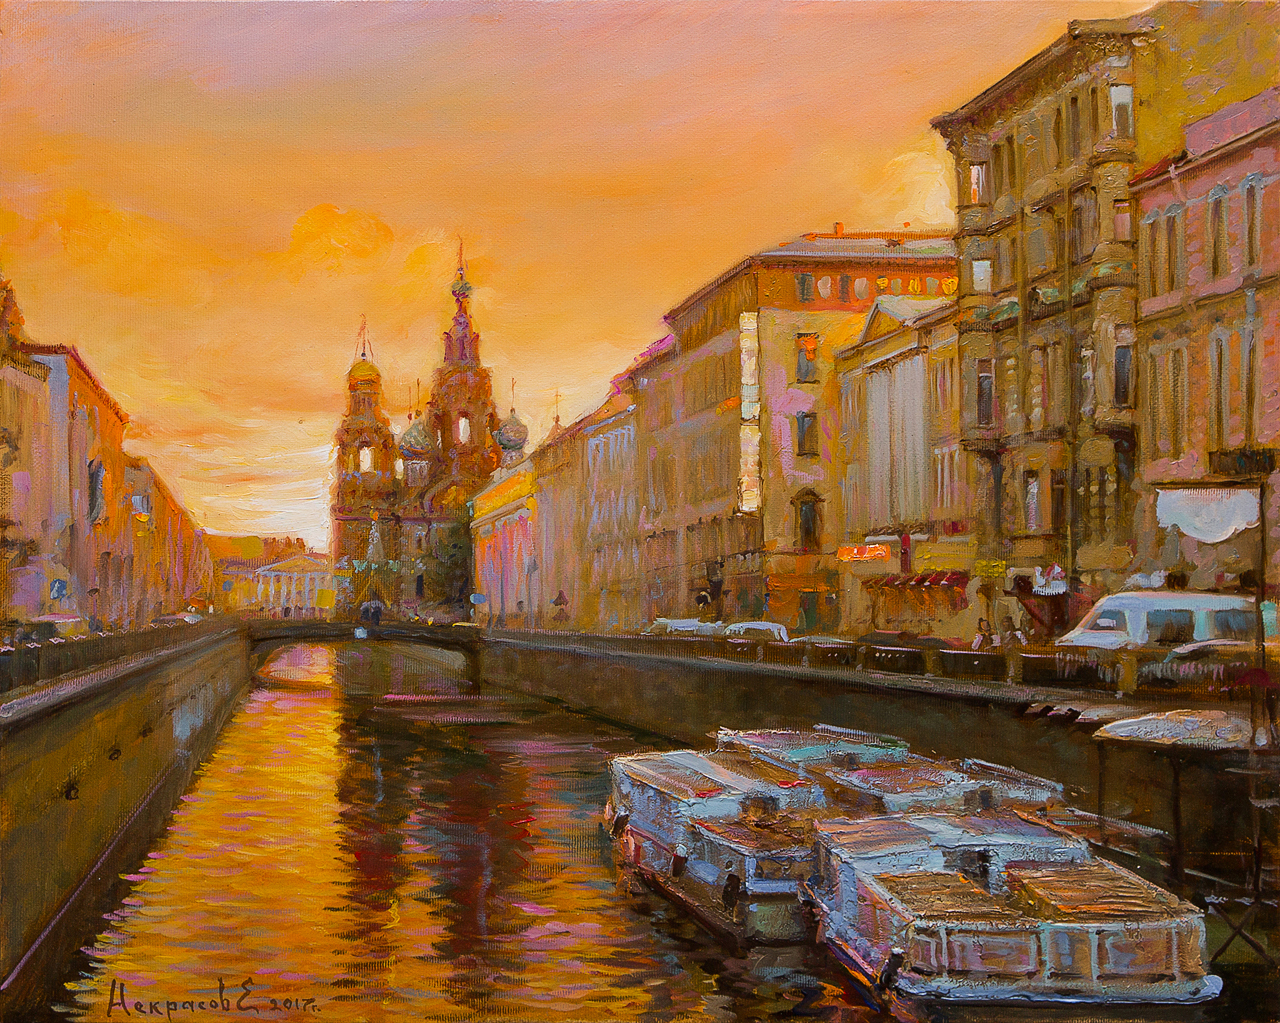 Картина маслом Закат на набережной канала Грибоедова Некрасов некрасов некрасов последние песни